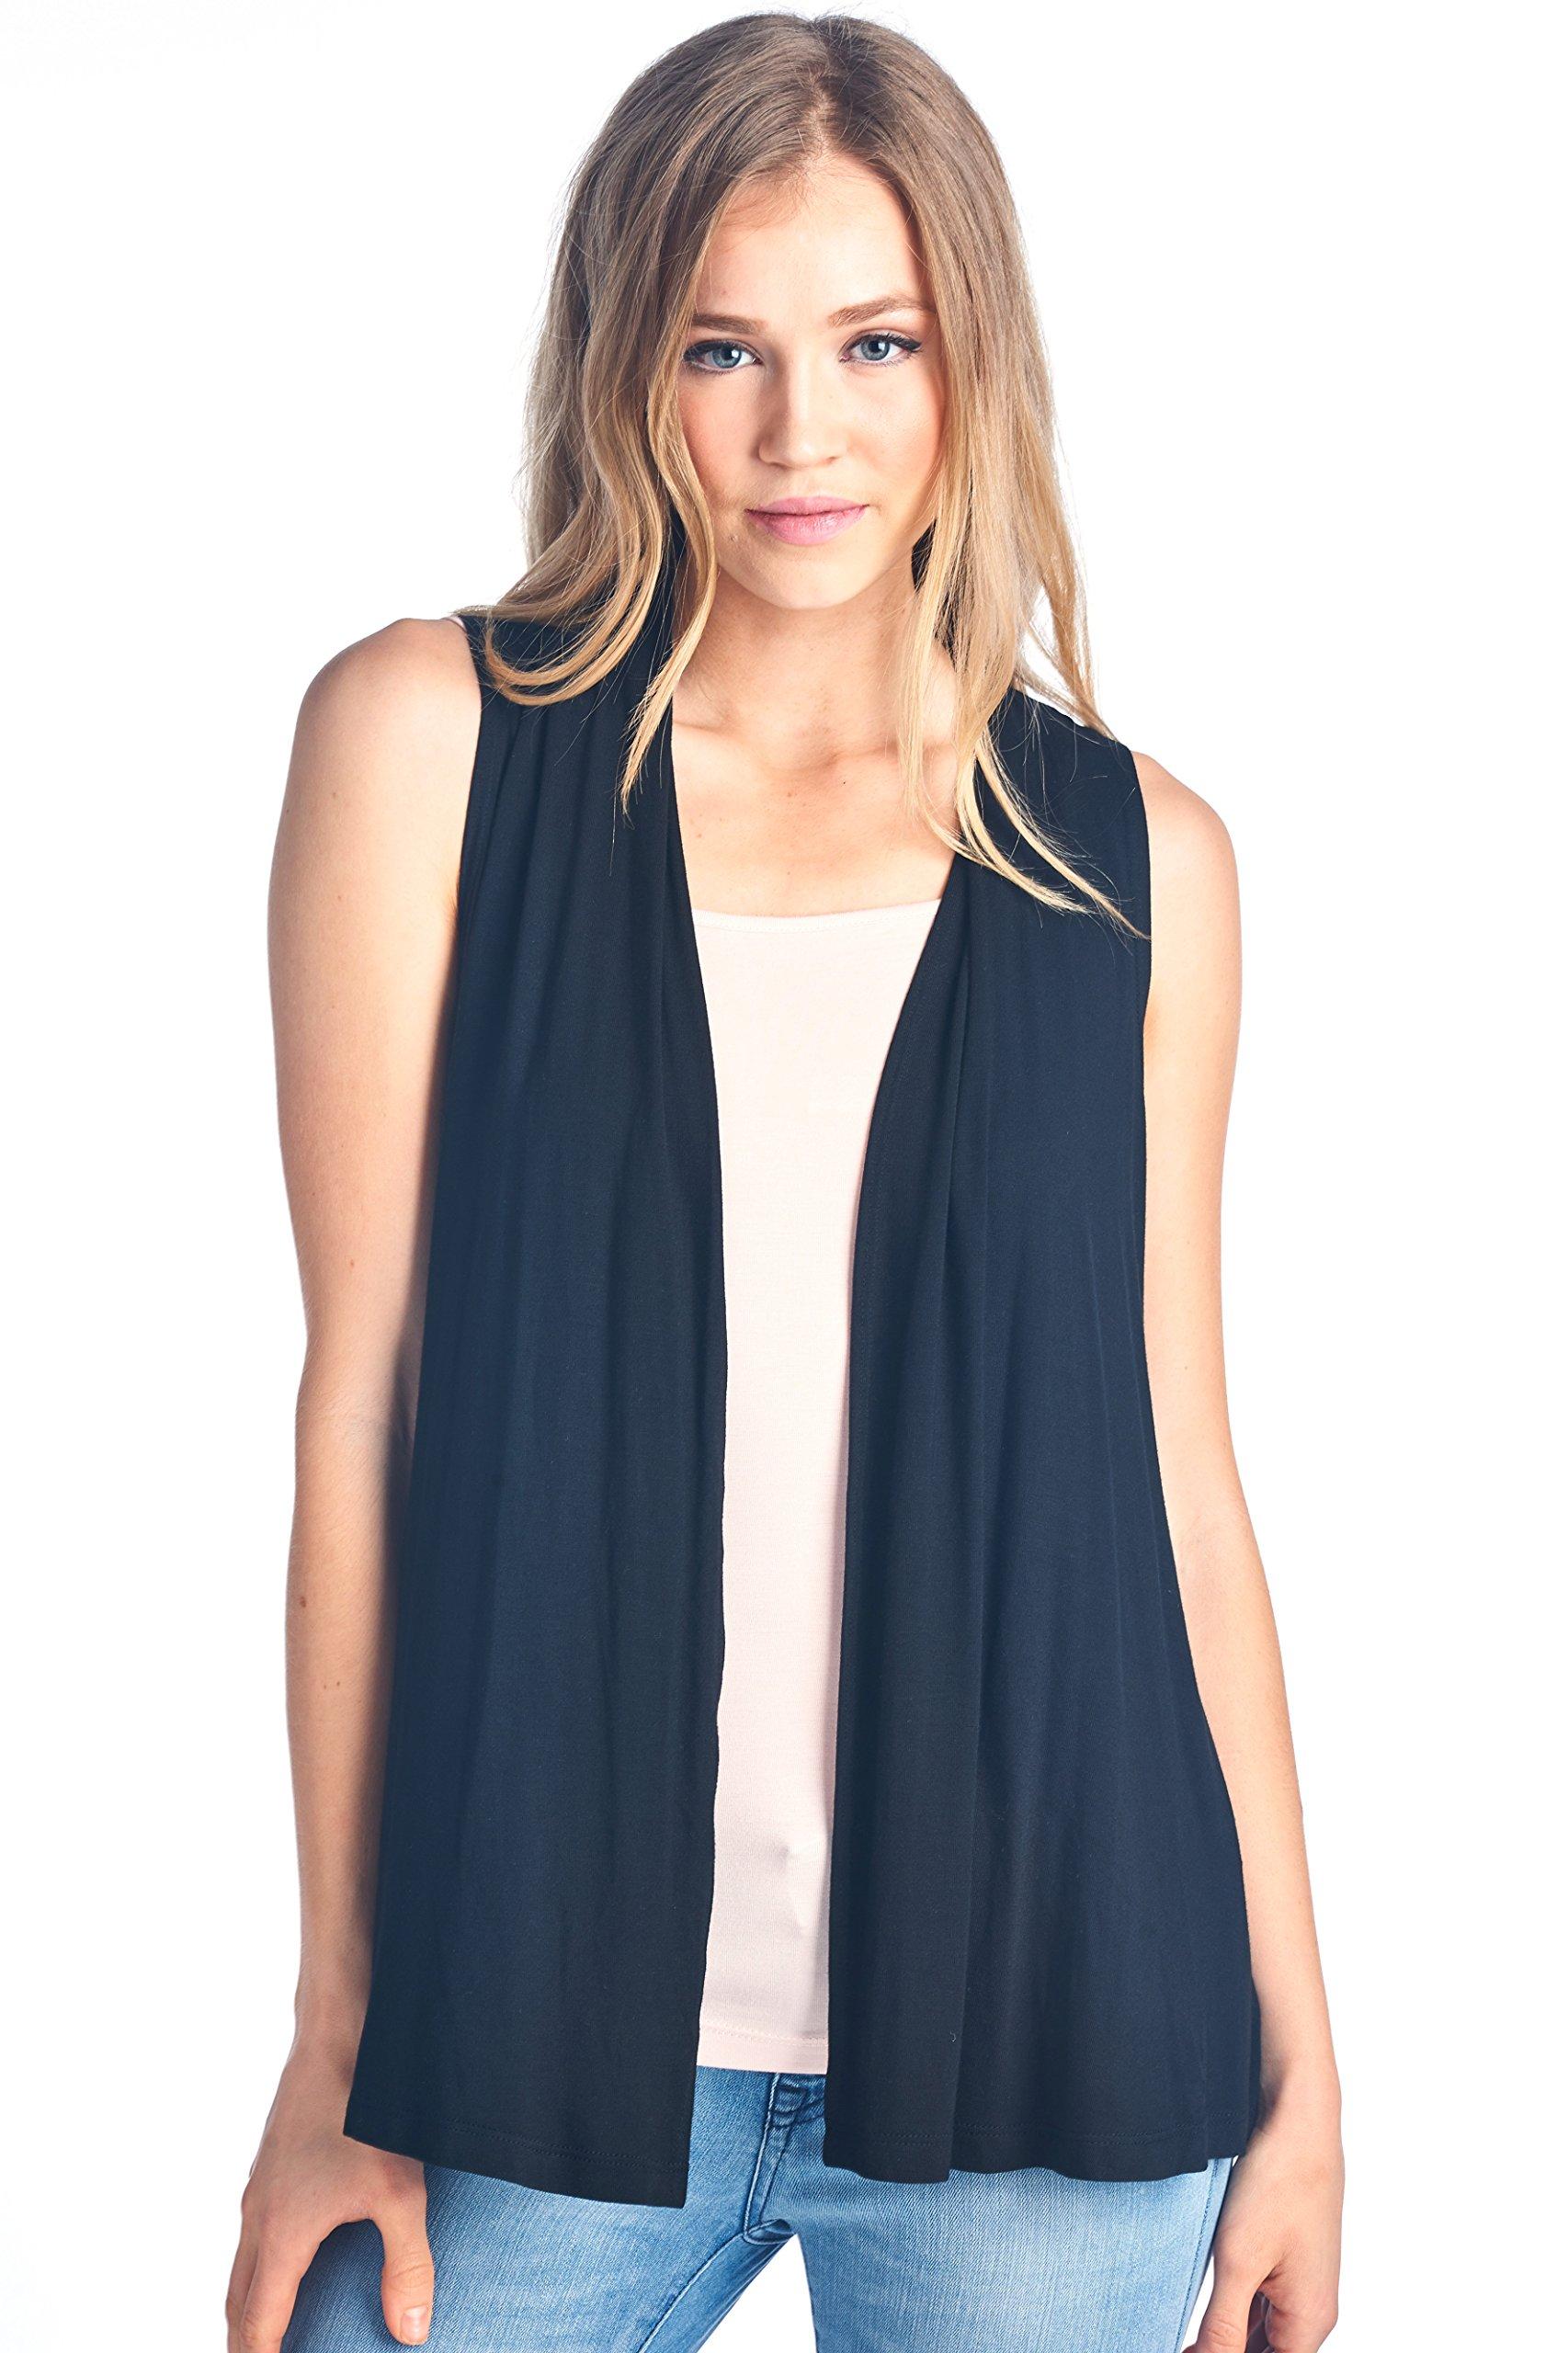 ReneeC.. Women's Extra Soft Natural Bamboo Sleeveless Cardigan - Made in USA (Large, Black)